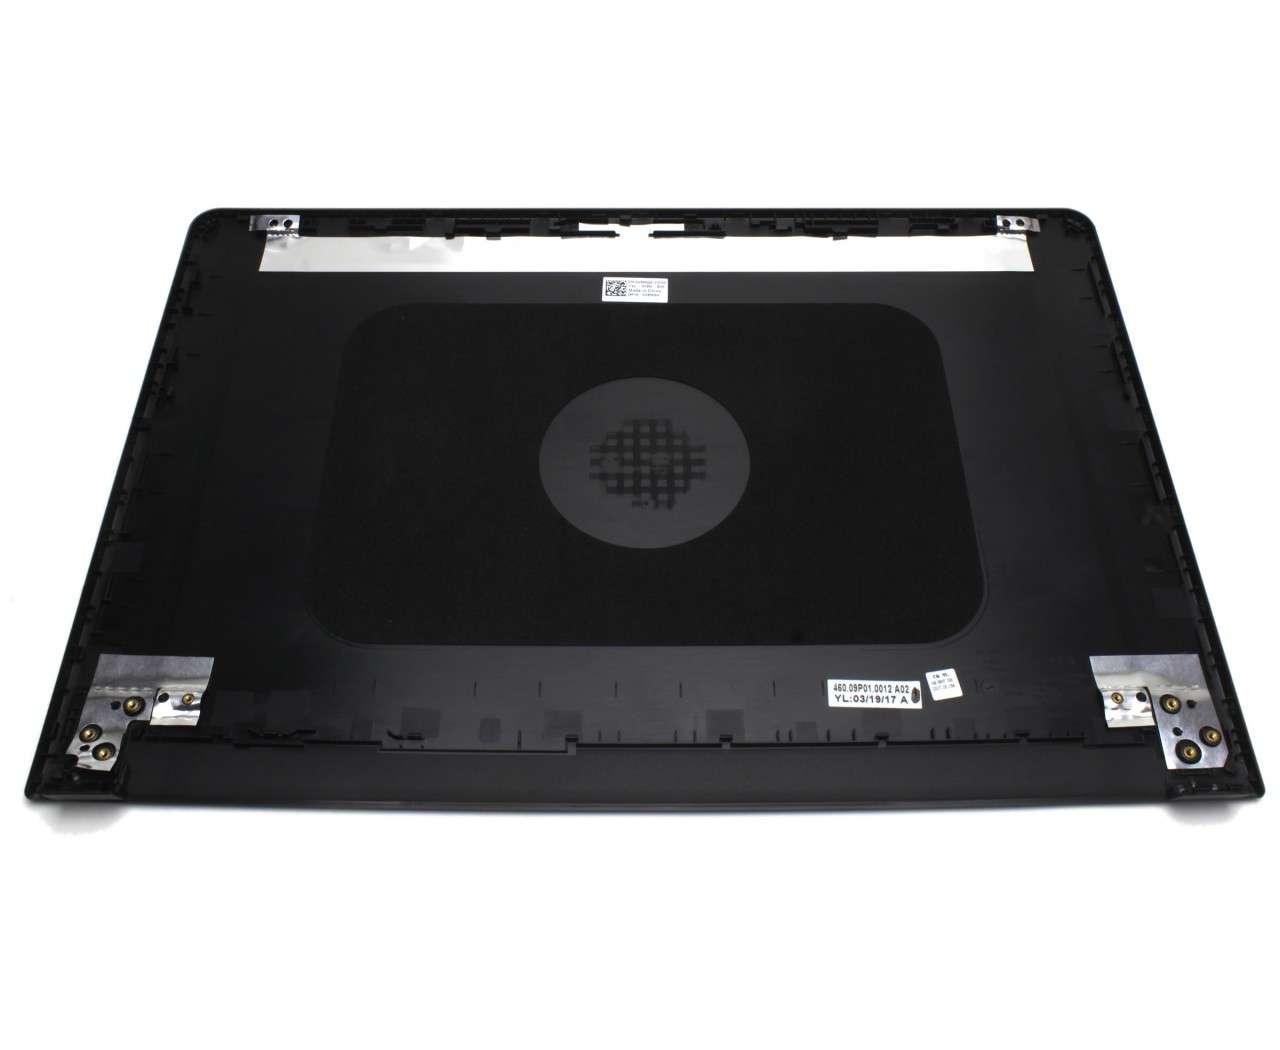 Capac Display BackCover Dell Vostro 15 3568 Carcasa Display Neagra imagine powerlaptop.ro 2021